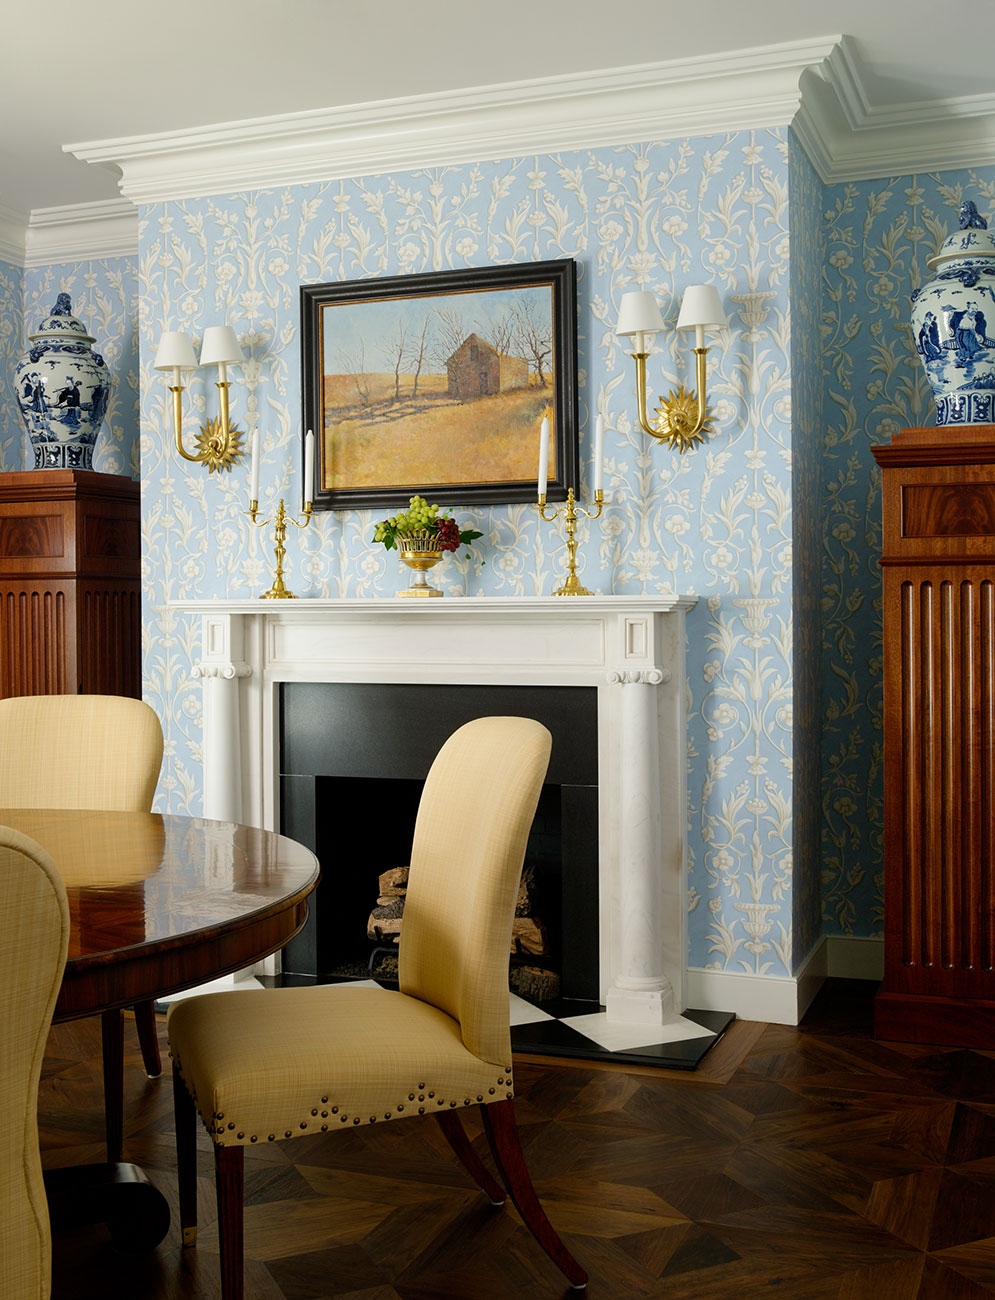 princeton residence, r. goodwin ltd.